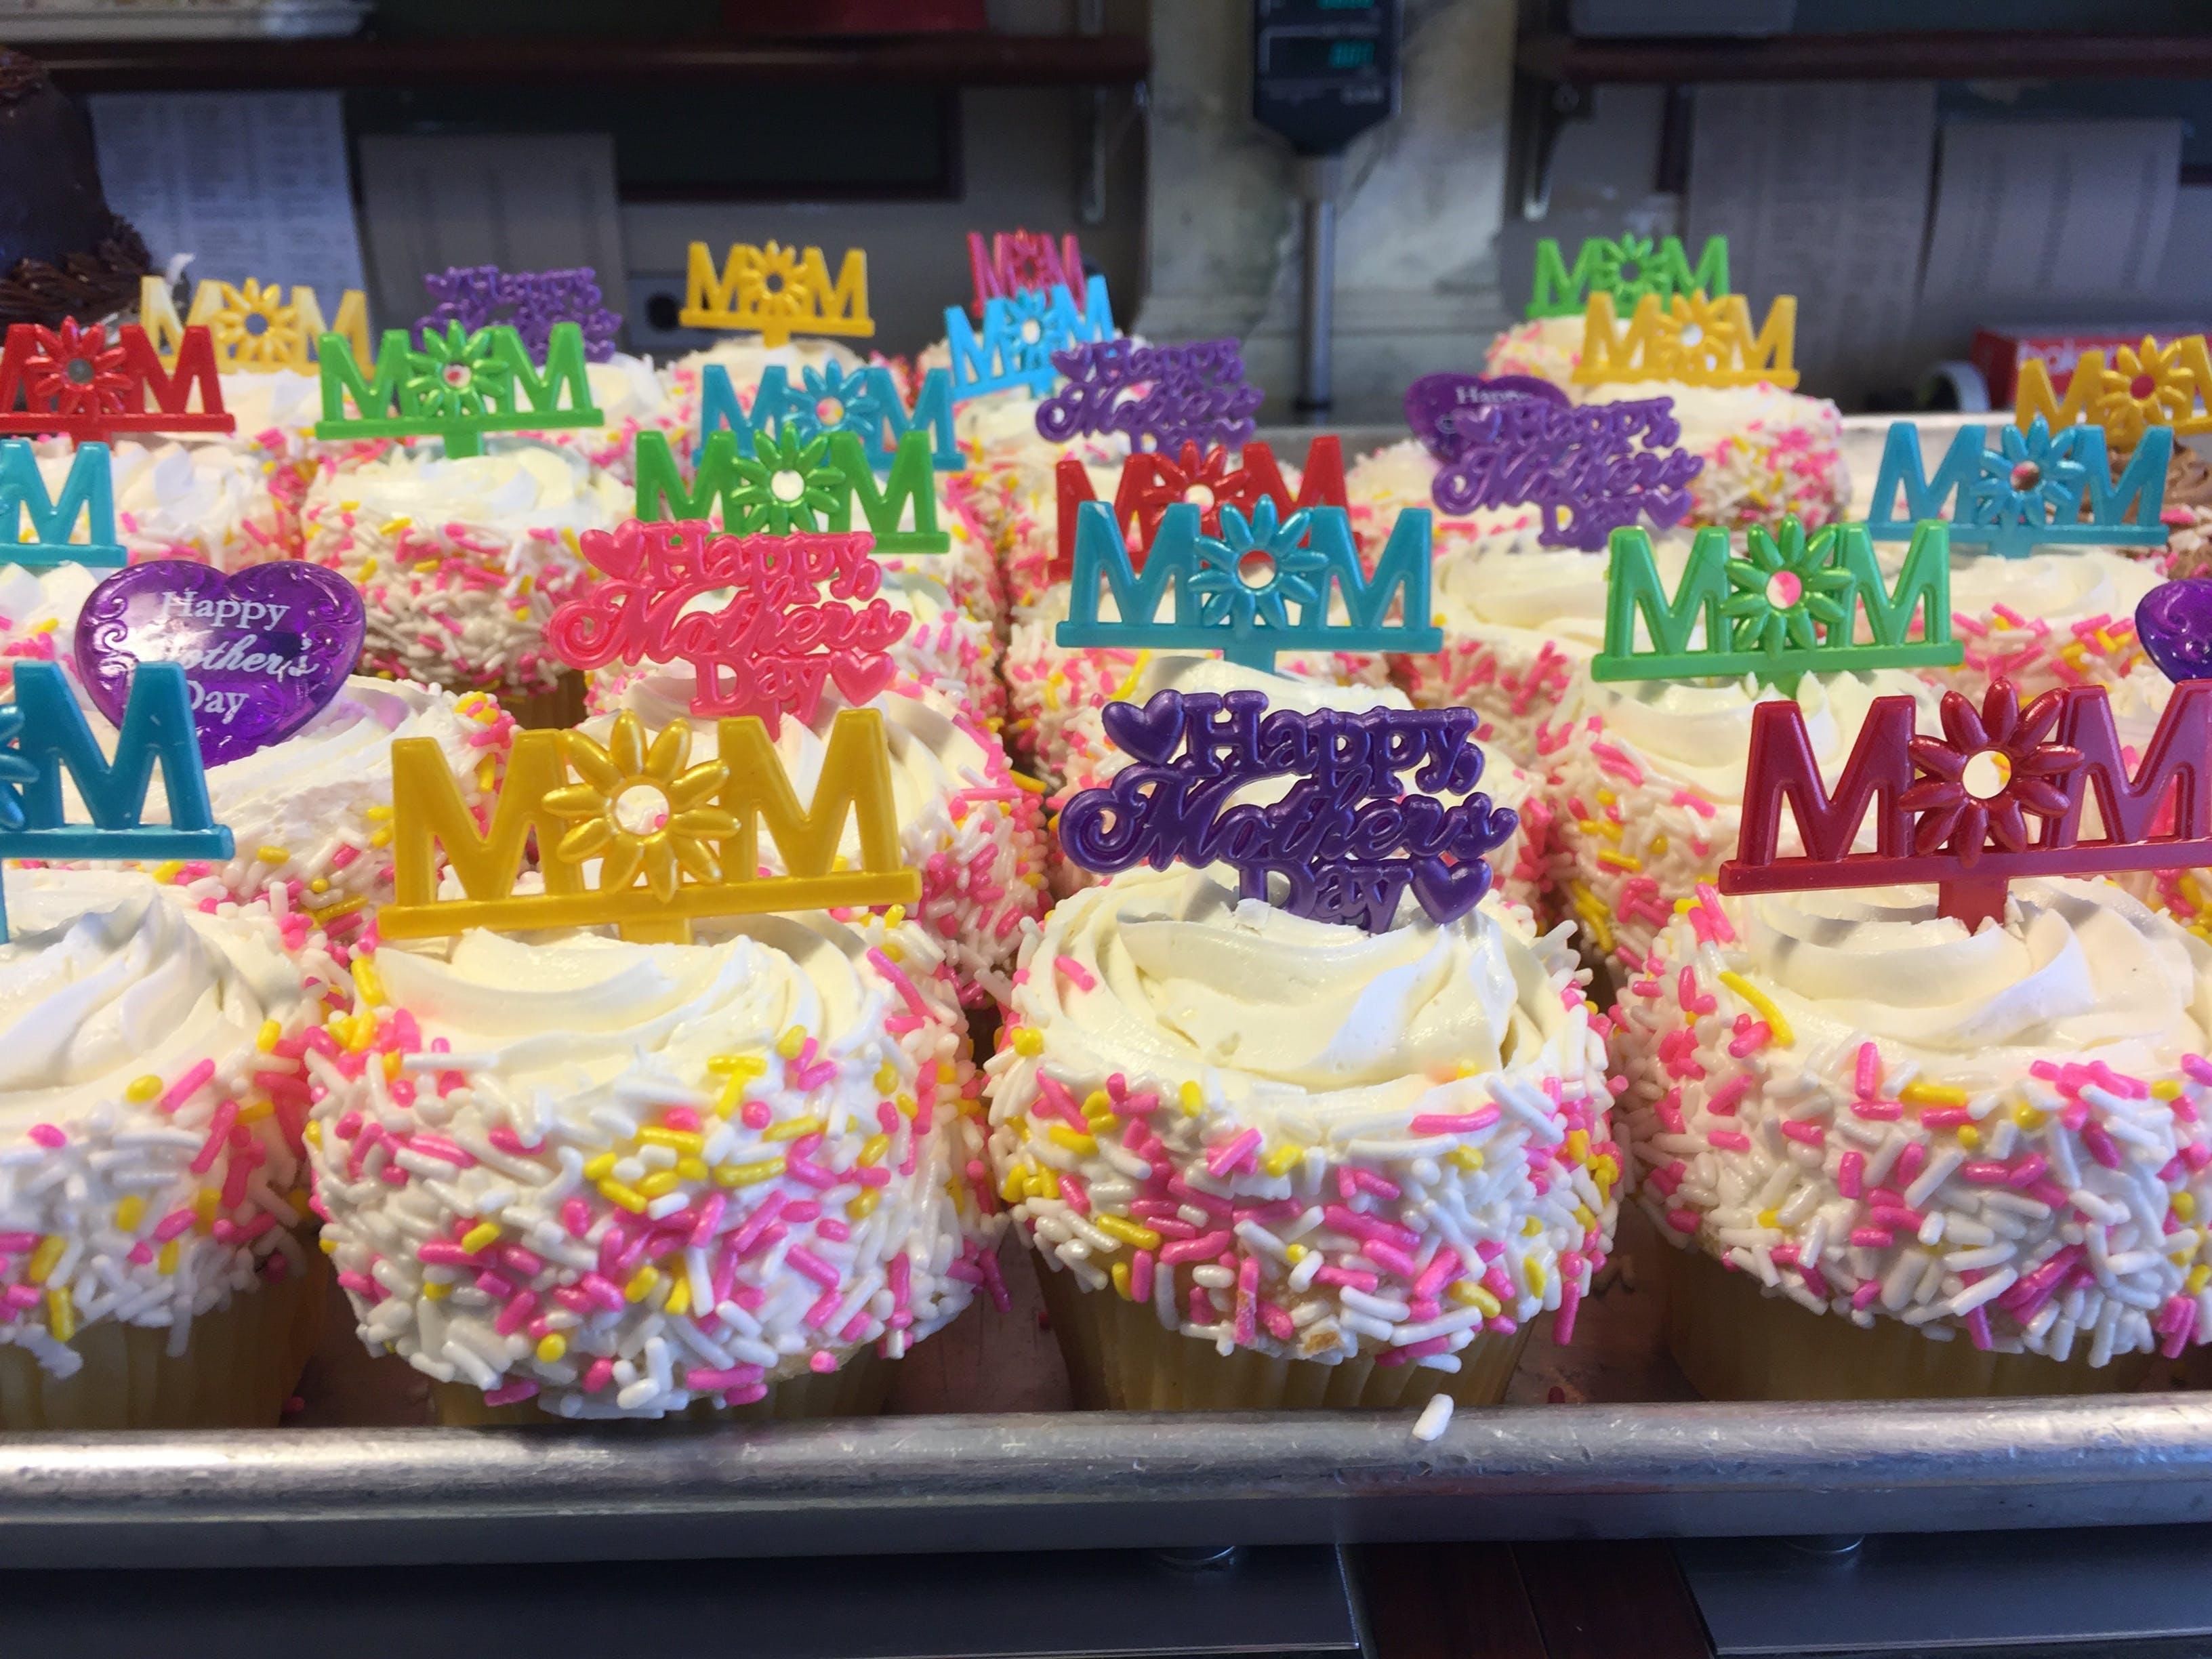 Kostenloses Stock Foto zu bäckerei, cupcakes, desserts, mama